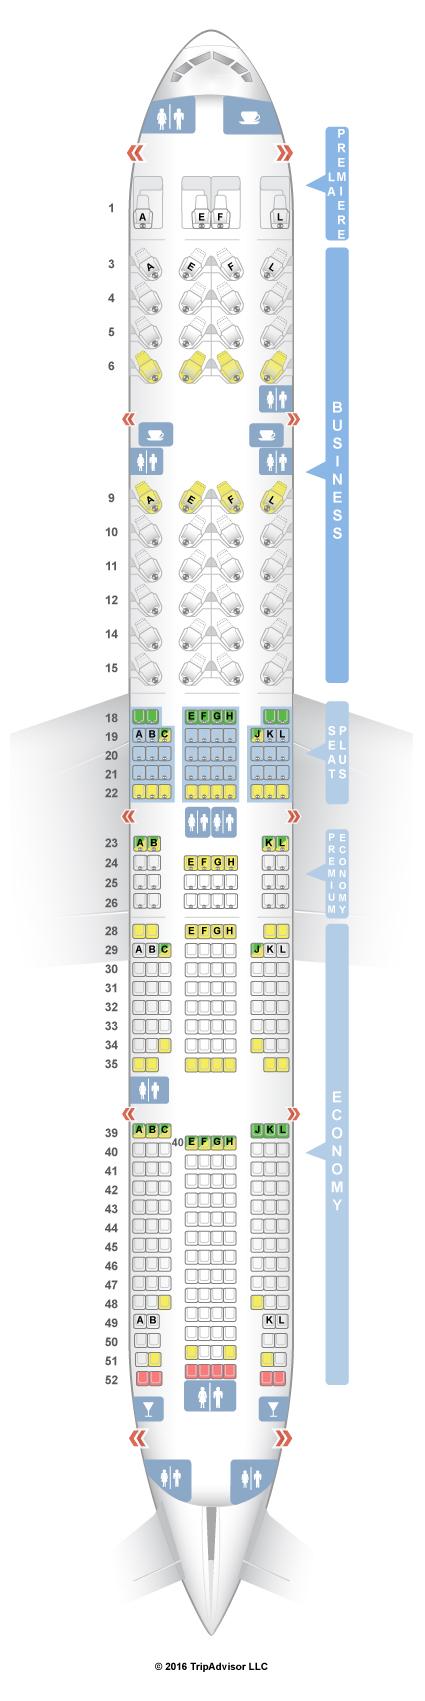 SeatGuru Seat Map Air France Boeing 777-300ER (77W) Four Class V2